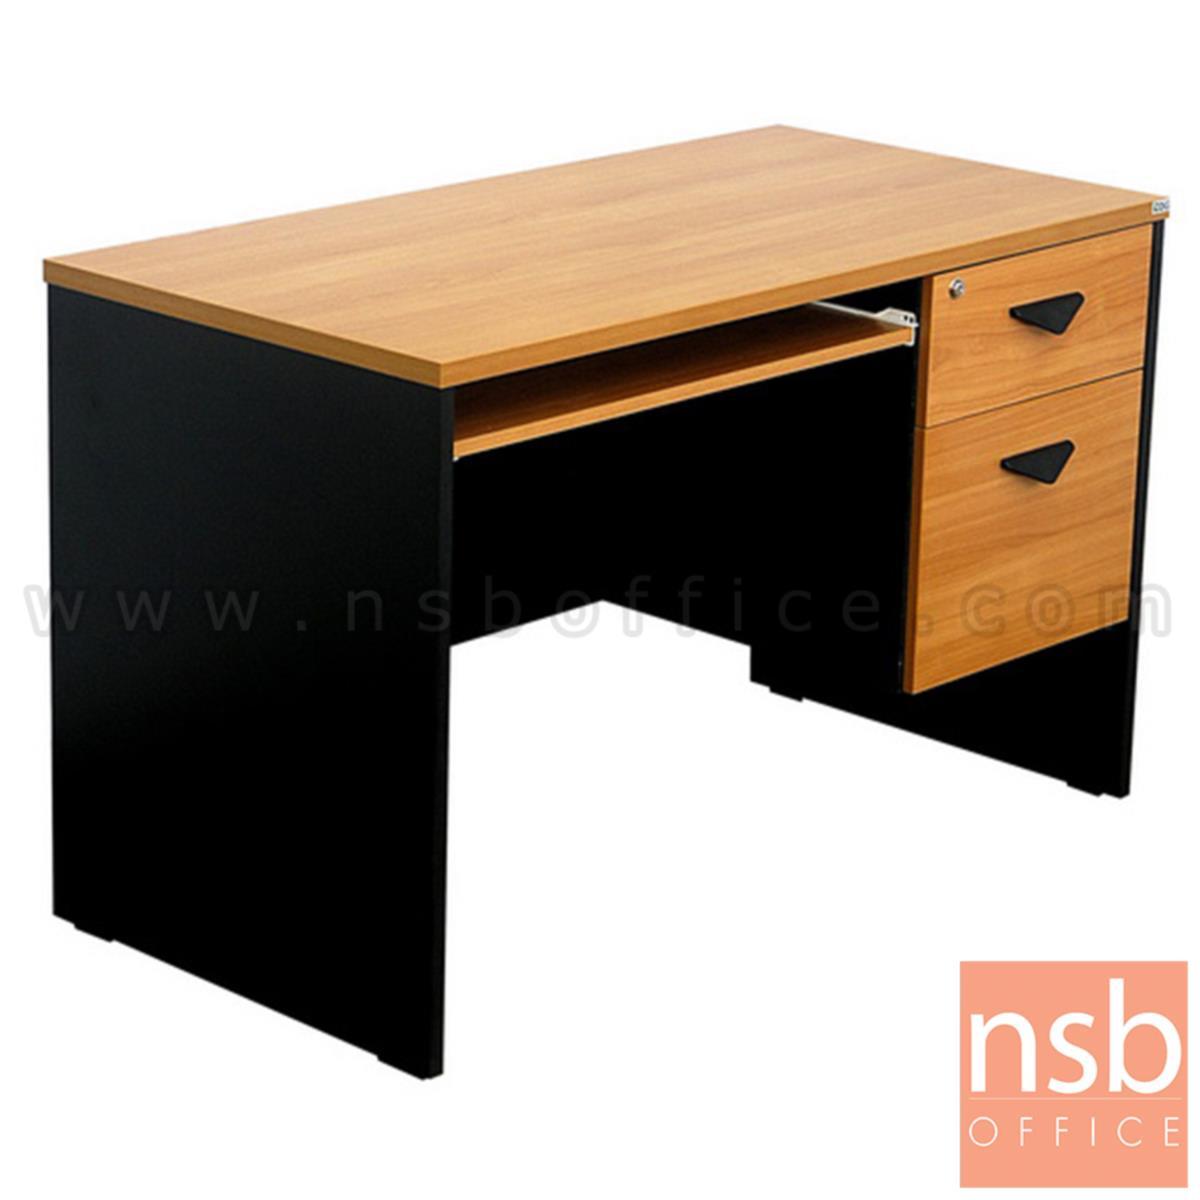 A12A017:โต๊ะคอมพิวเตอร์ 2 ลิ้นชัก  รุ่น Chic (ชีก) ขนาด 120W cm. พร้อมรางคีย์บอร์ด